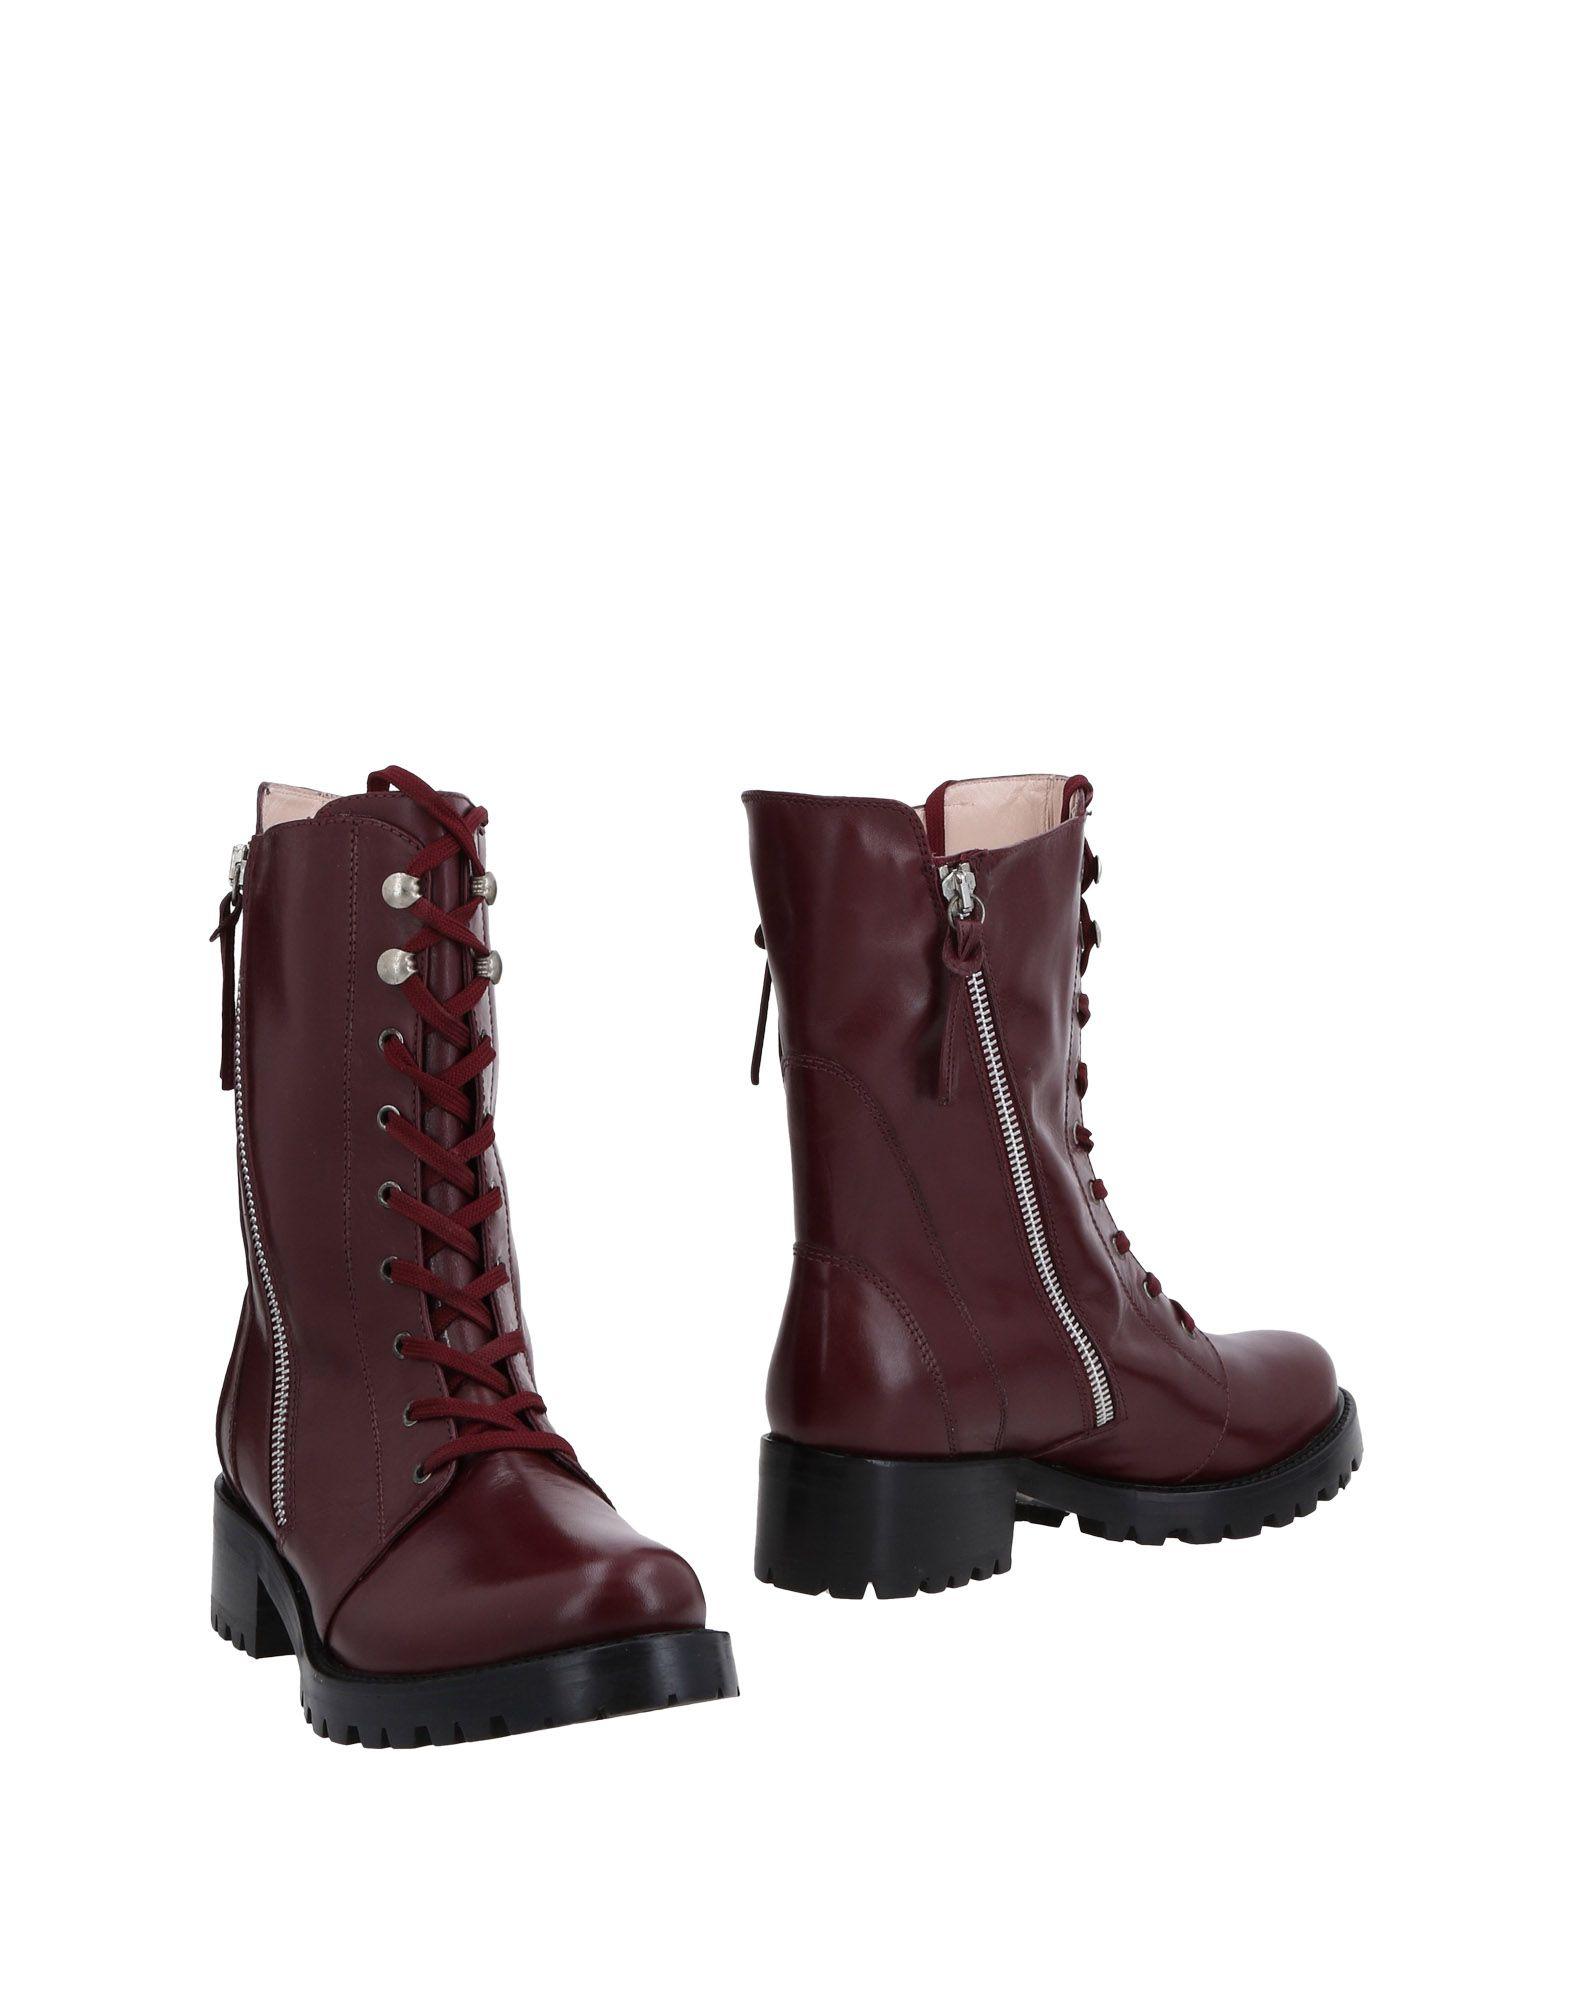 Cavallini Stiefelette Damen  11484076QCGut Schuhe aussehende strapazierfähige Schuhe 11484076QCGut 25eb42